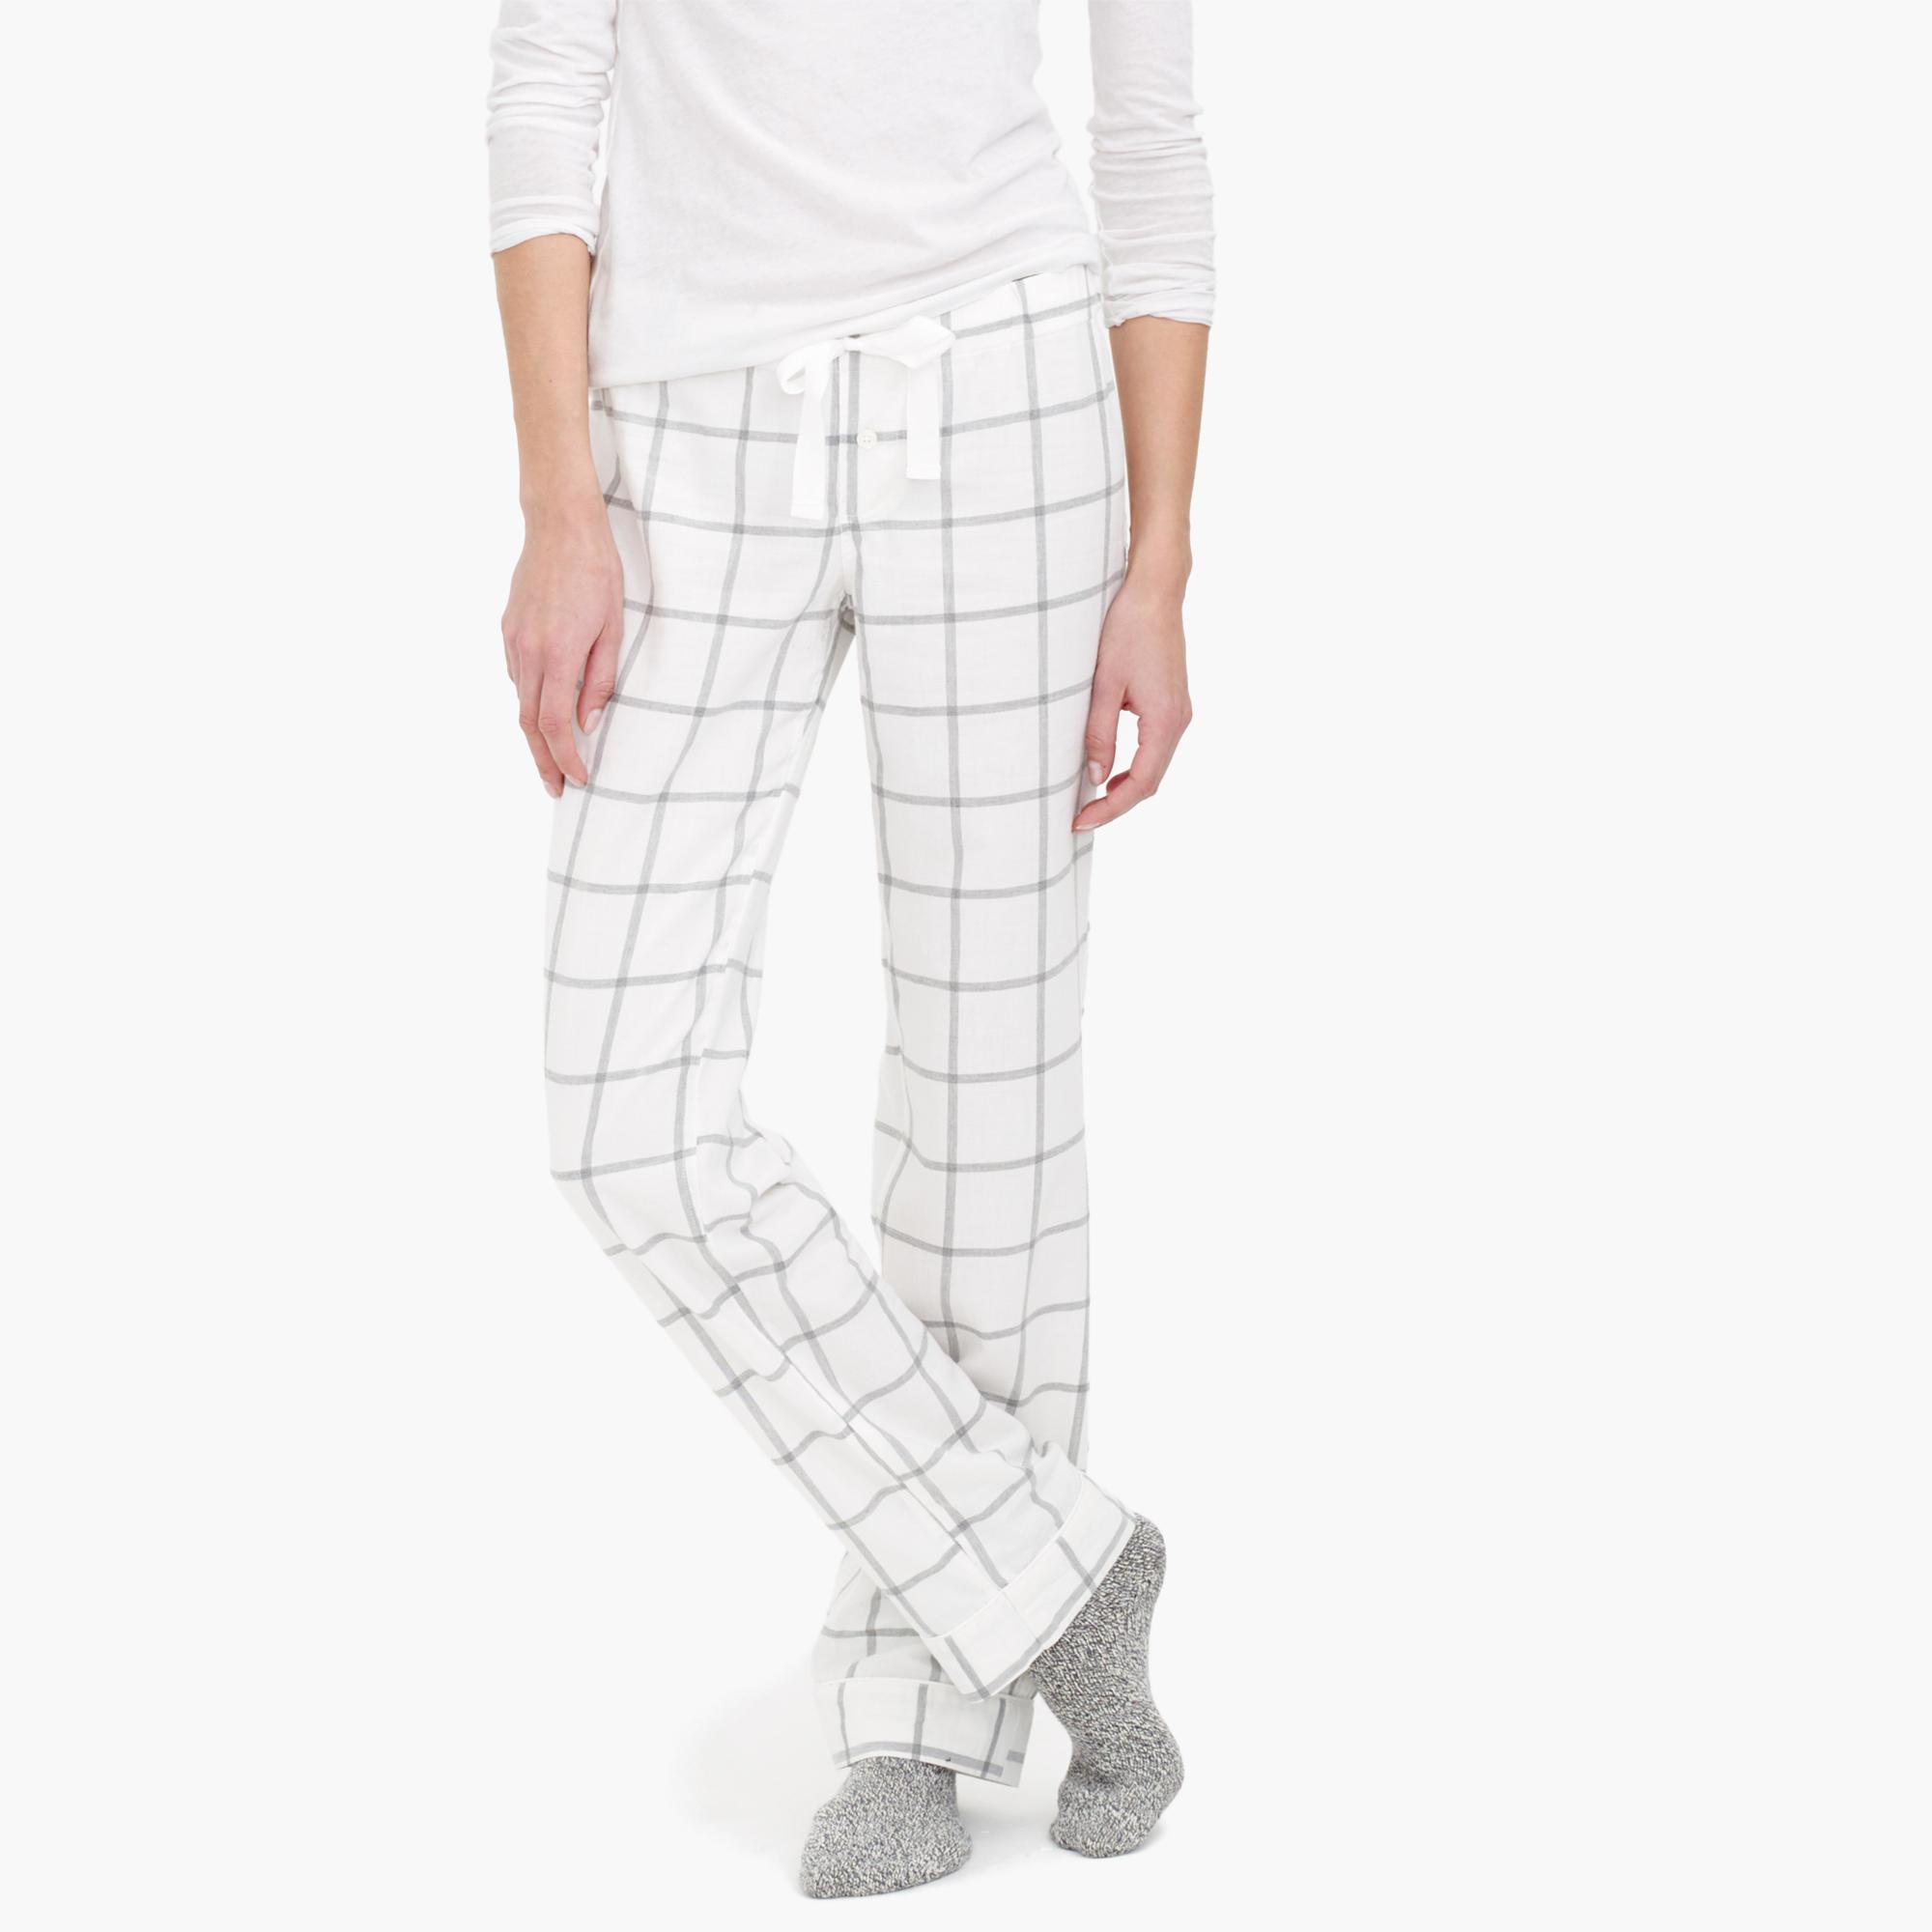 1df7aadca033 Lyst - J.Crew Windowpane Plaid Flannel Pajama Pant in Gray